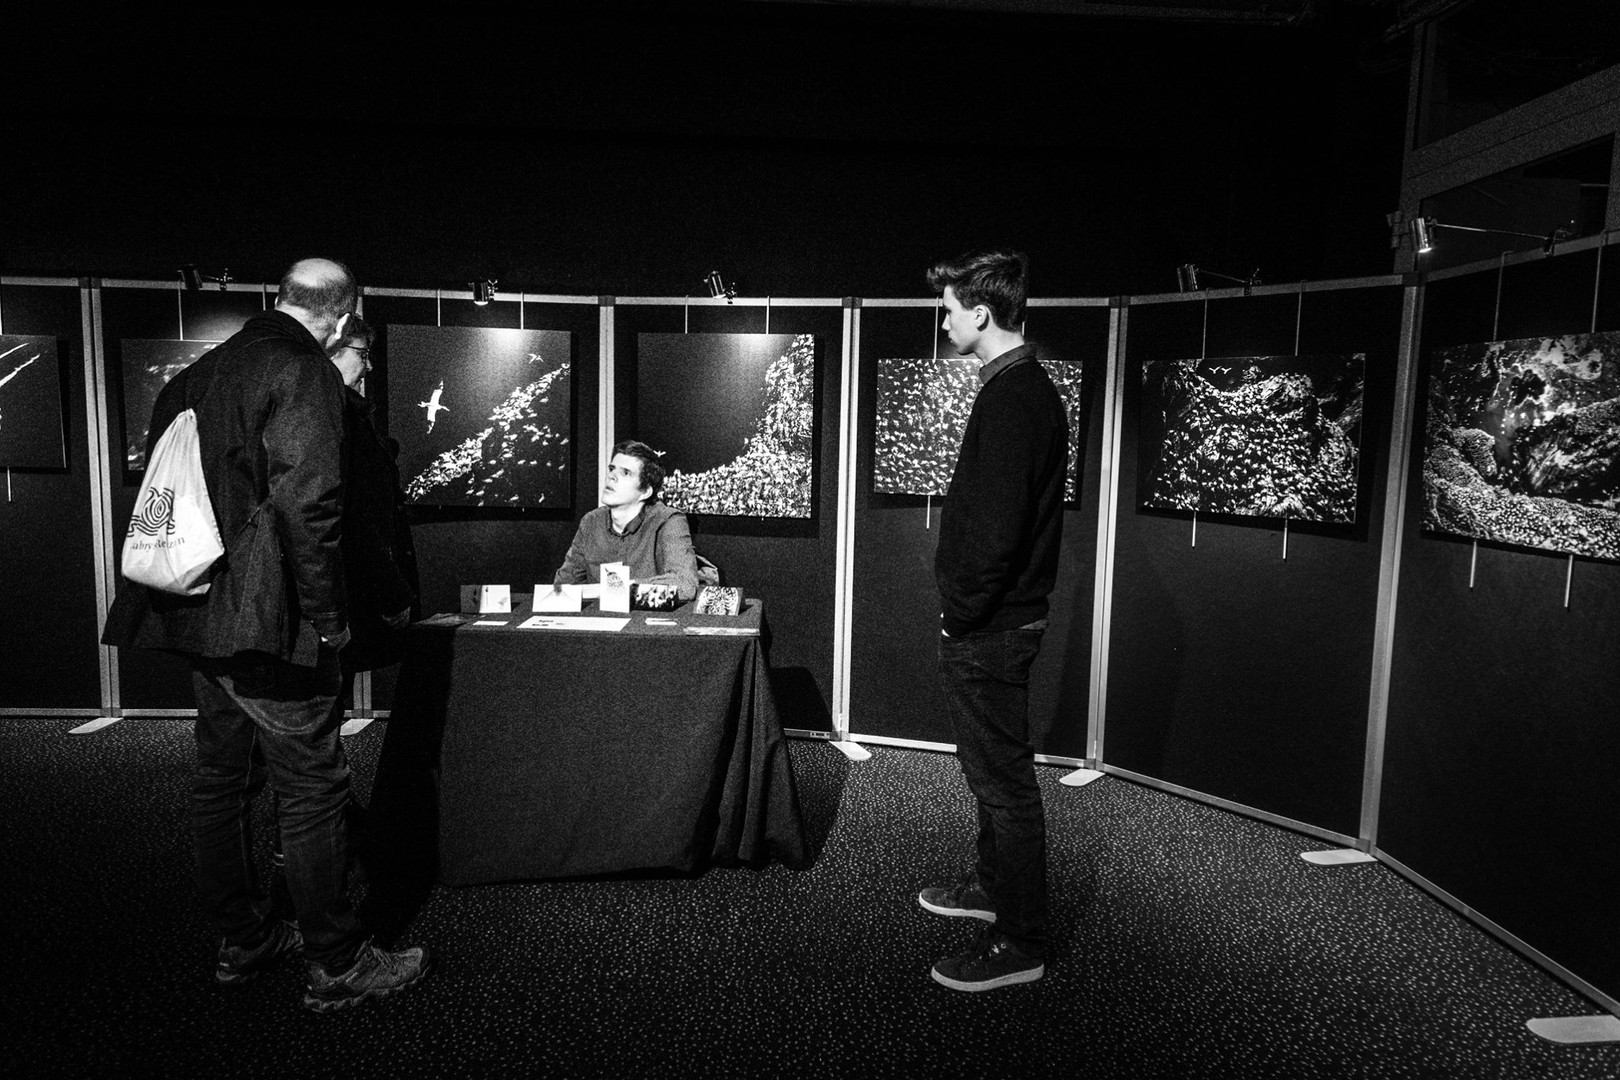 Lowlandphotofestival 2019